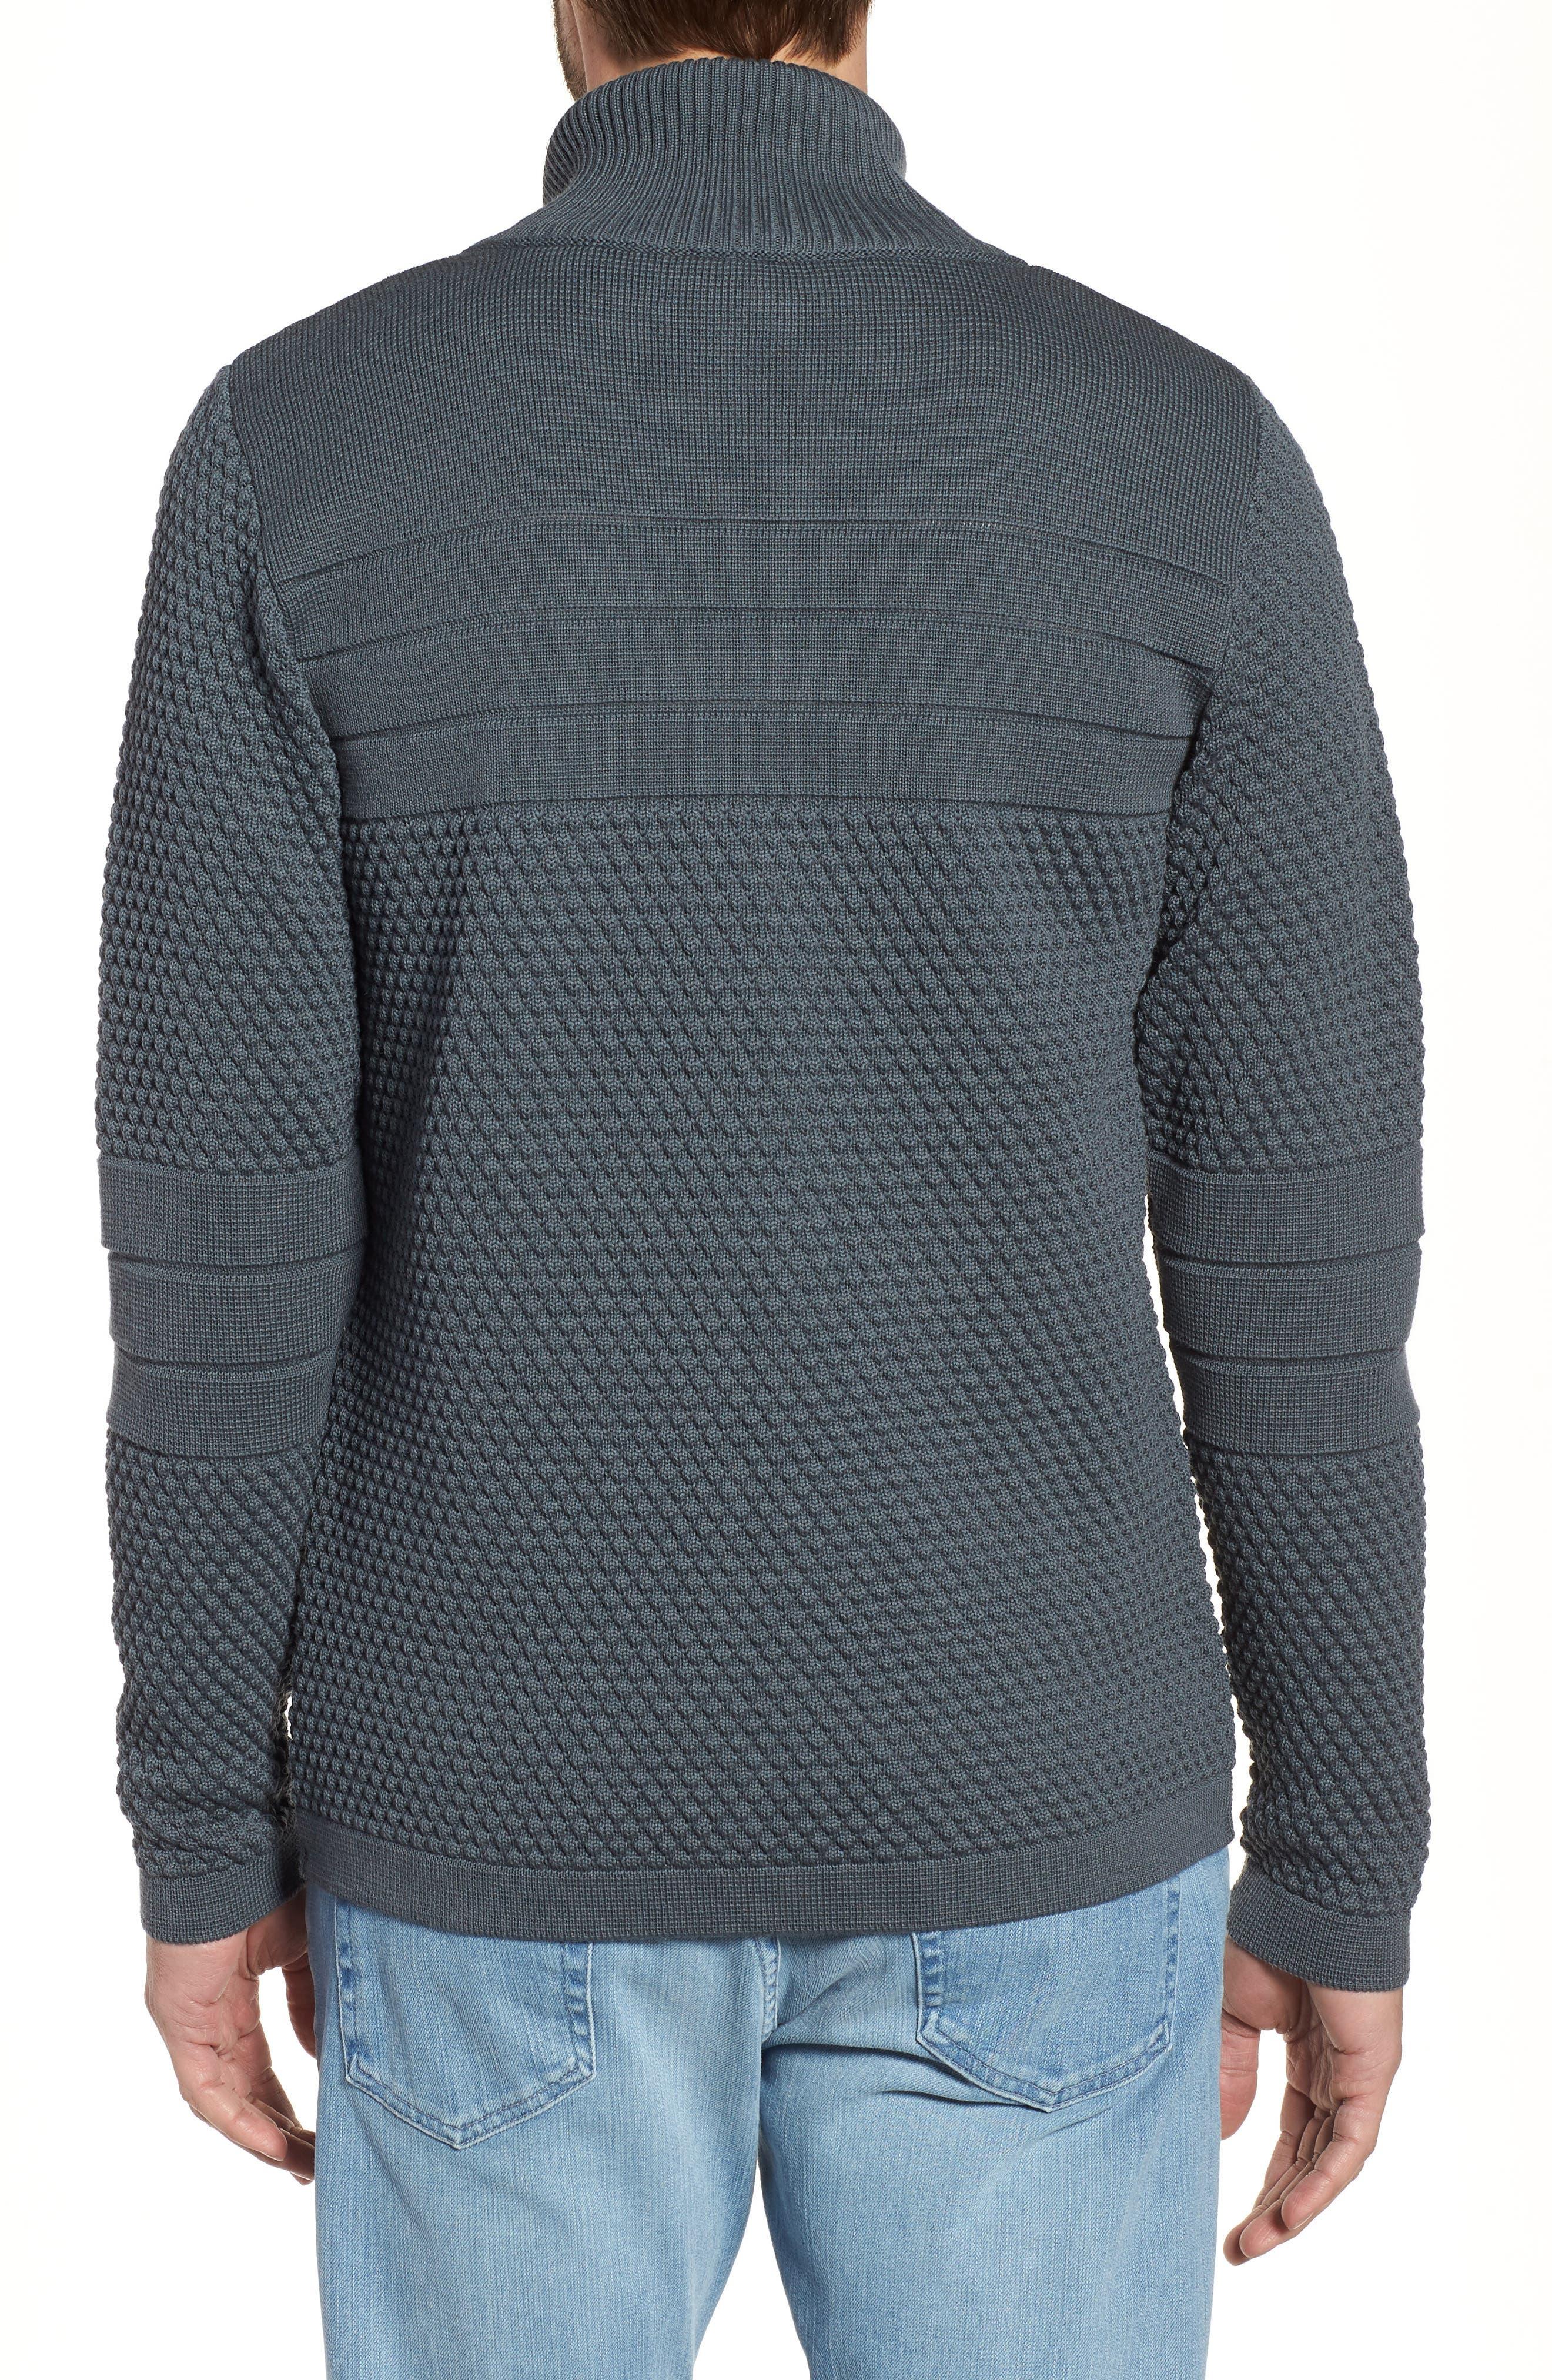 Torso Jacket,                             Alternate thumbnail 2, color,                             Uniform Grey